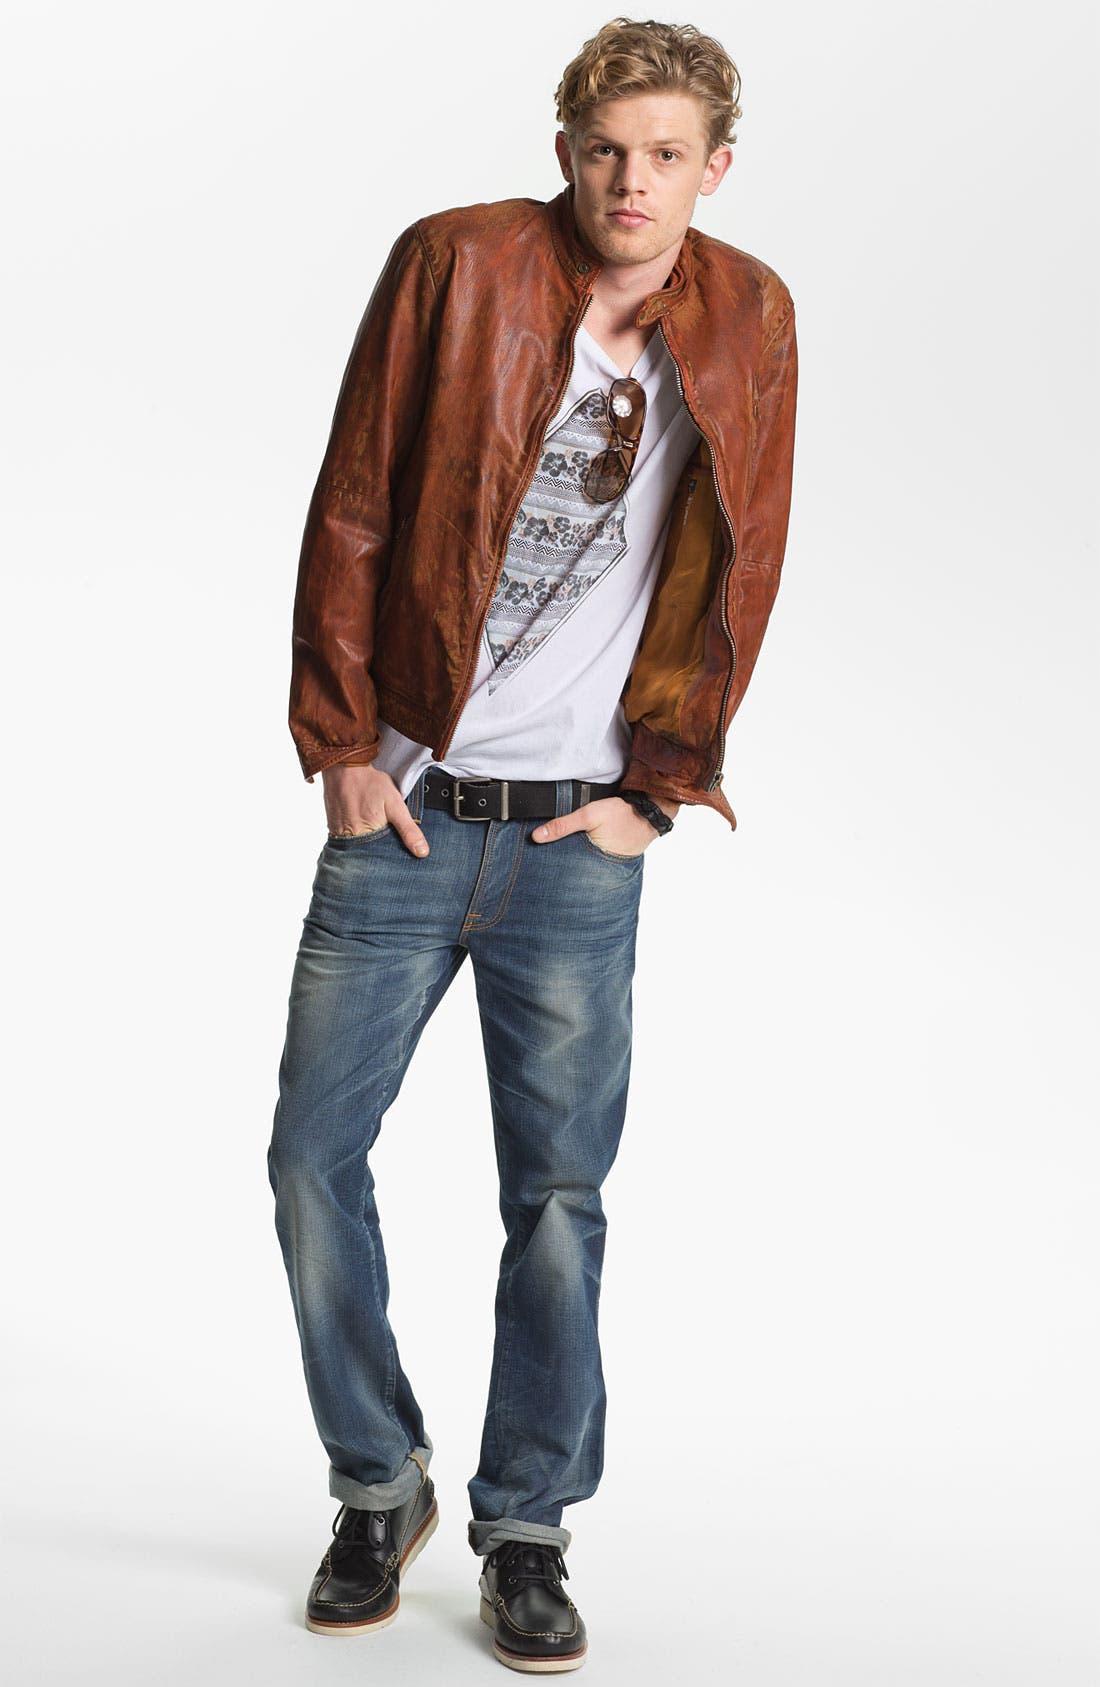 Main Image - Scotch & Soda Moto Jacket, Vanguard T-Shirt & Nudie Slim Straight Leg Jeans